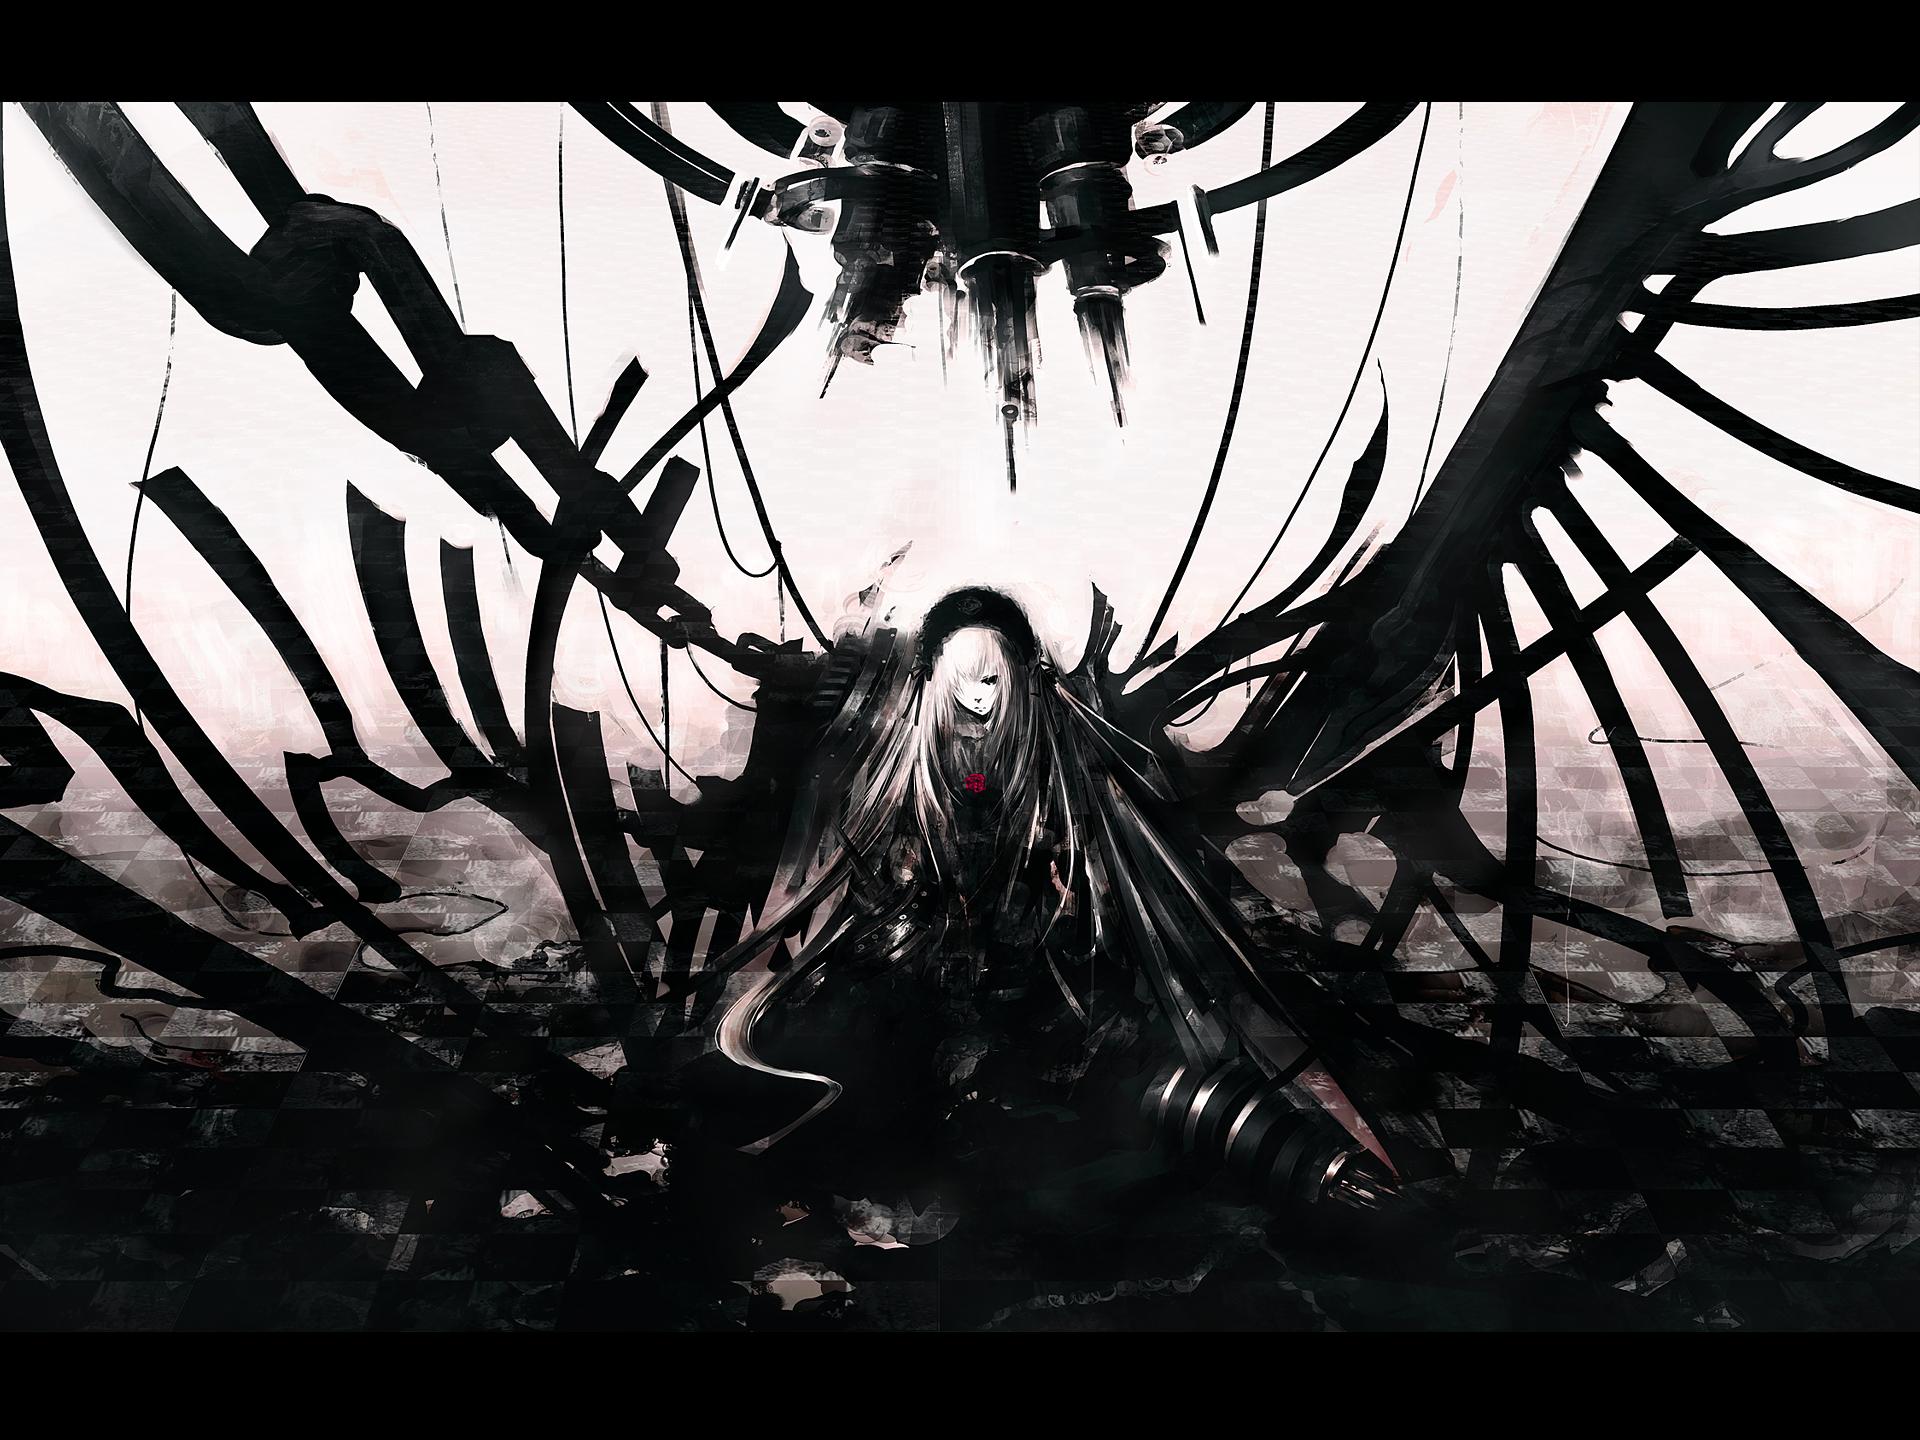 Dark Anime Wallpapers Widescreen : Anime Wallpaper - Arunnath com